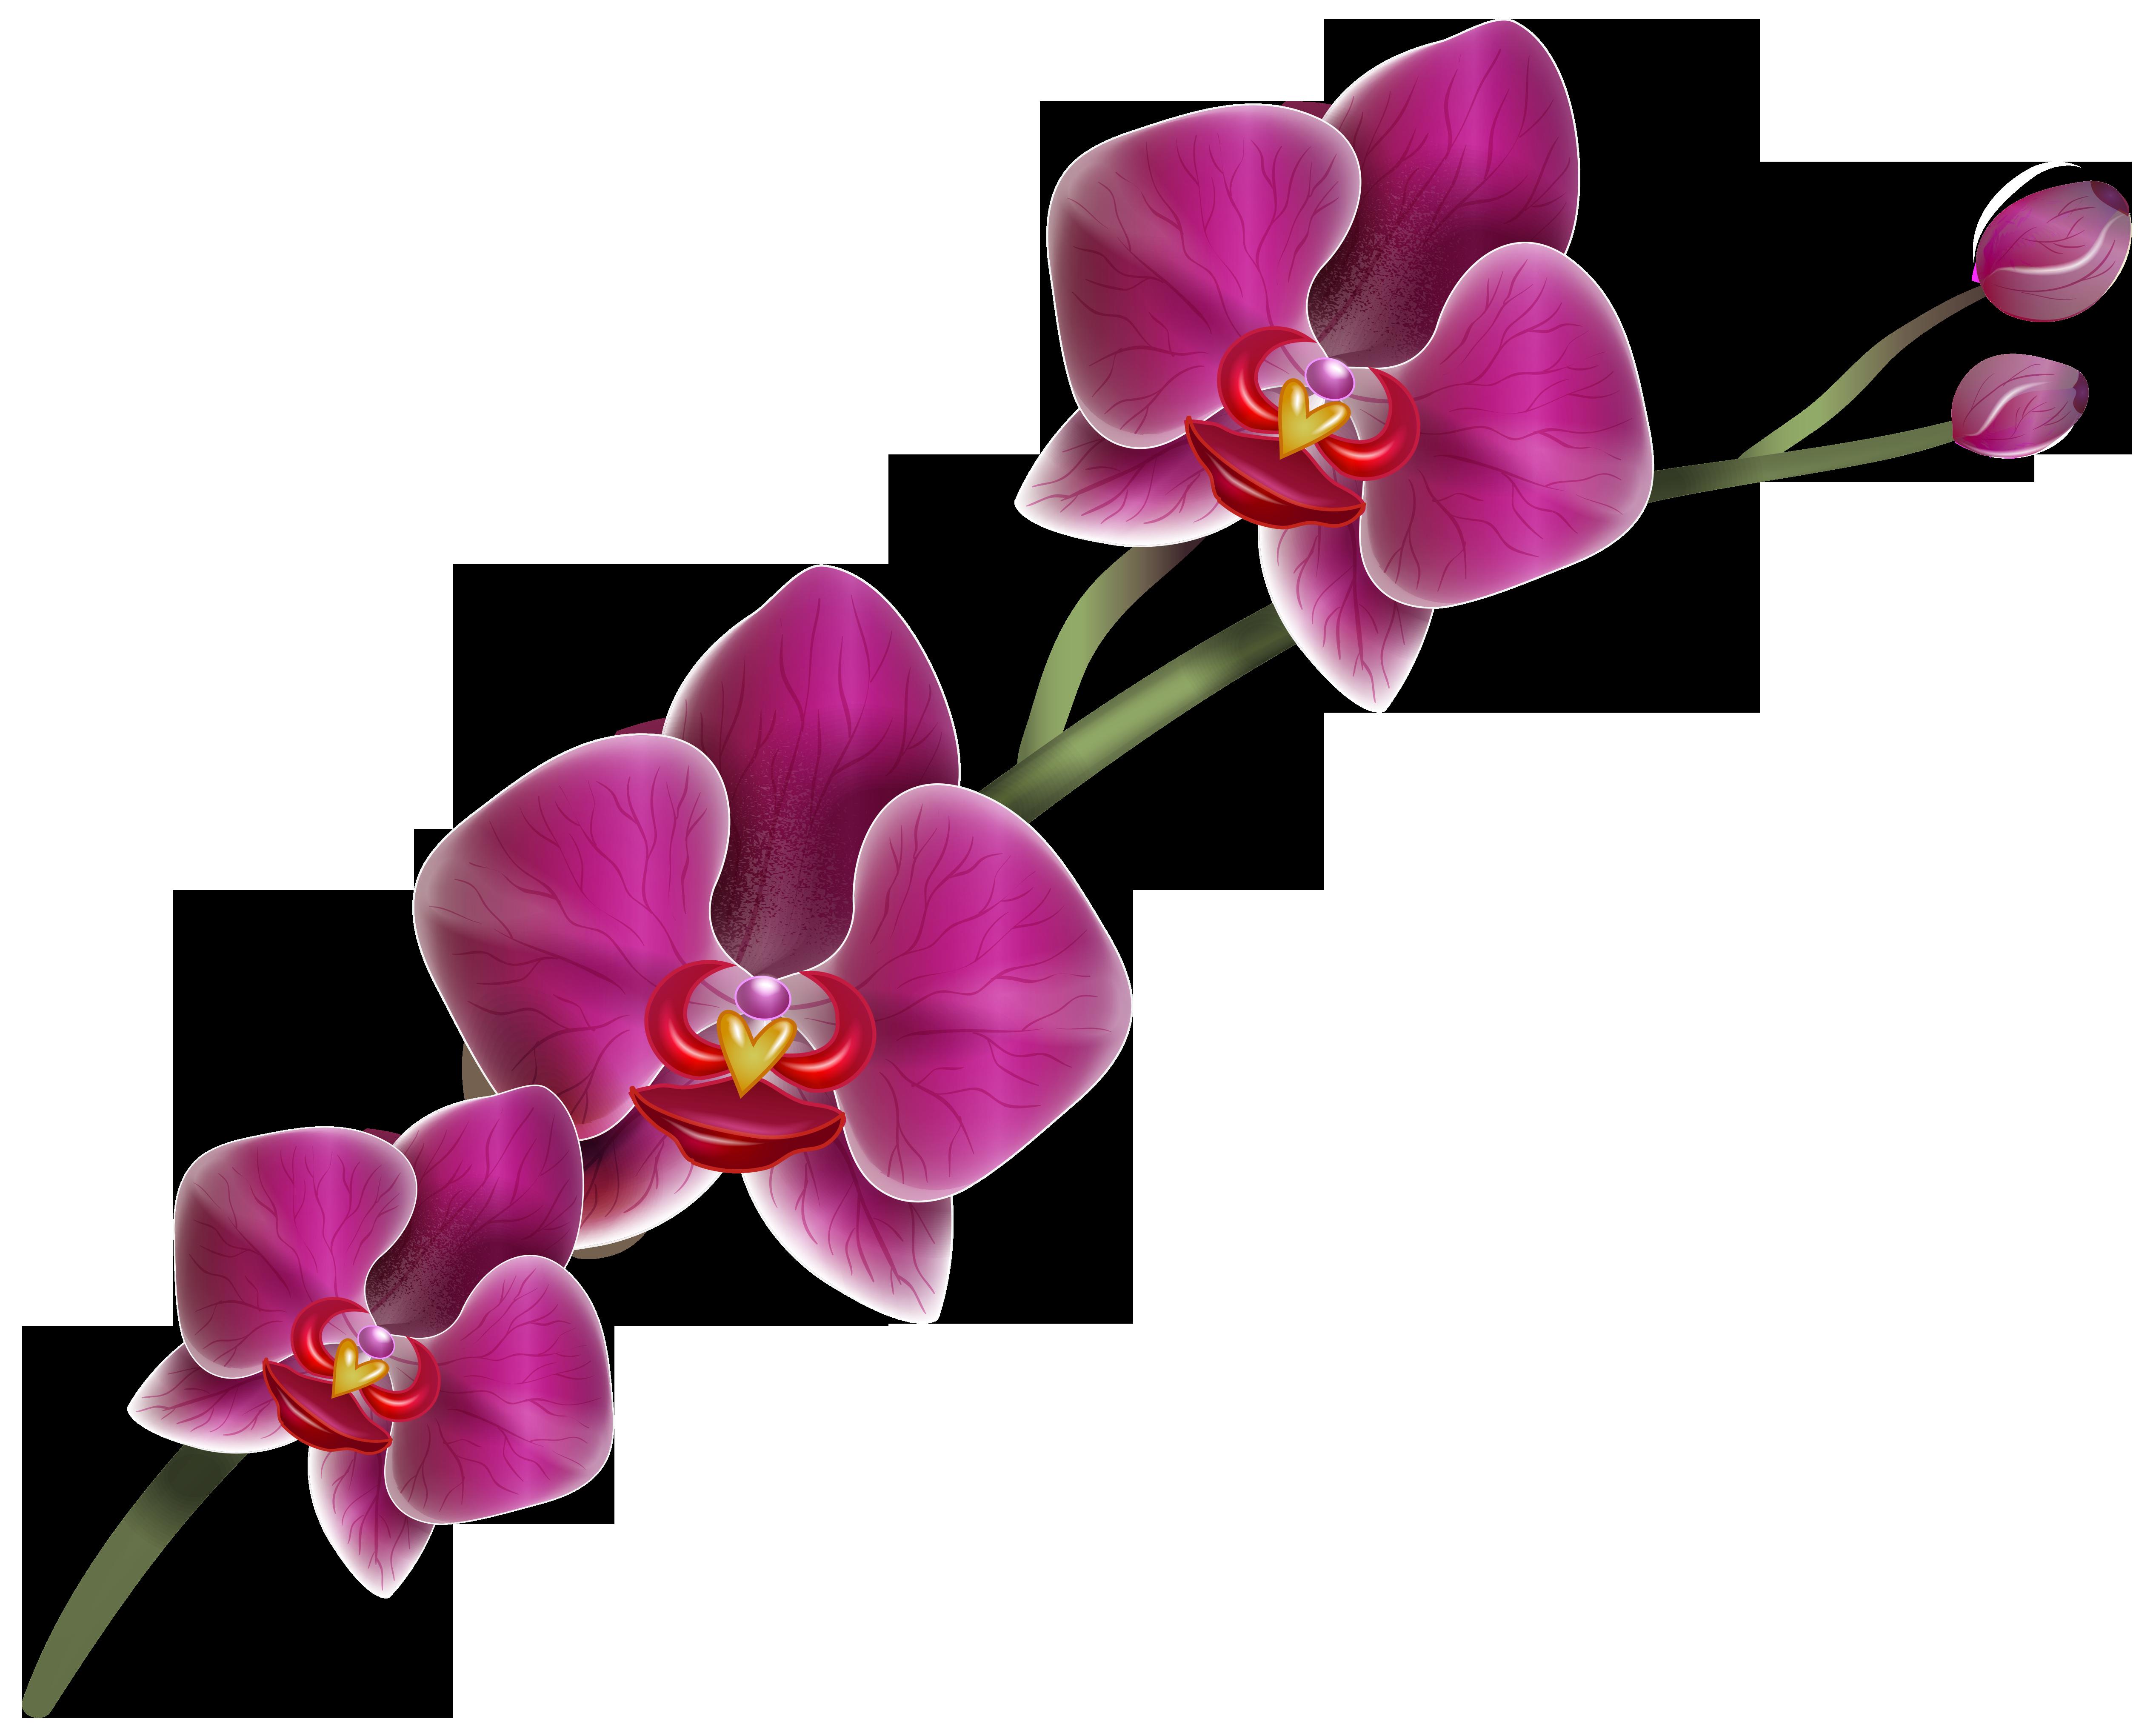 Purple Orchid Clipart Png Image Idee Idee Per La Casa